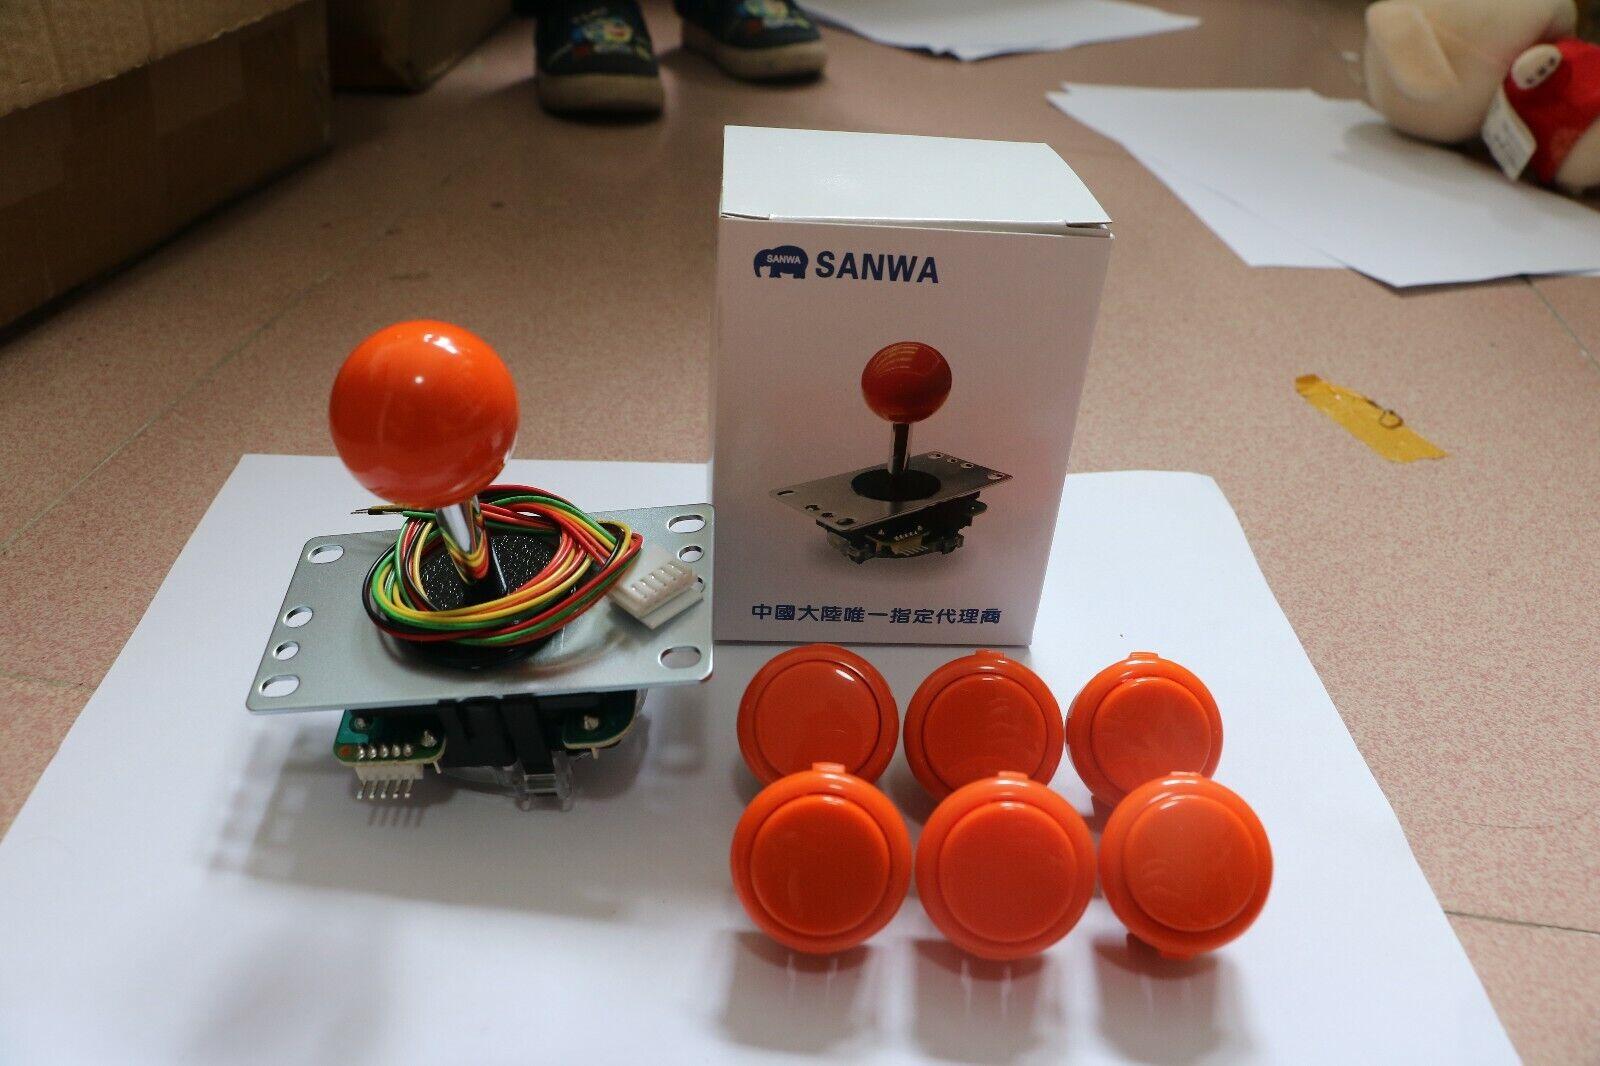 Original Sanwa PushButton OBSF-30 30mmArcade Jamma Game JoystickSwitch Purple 2